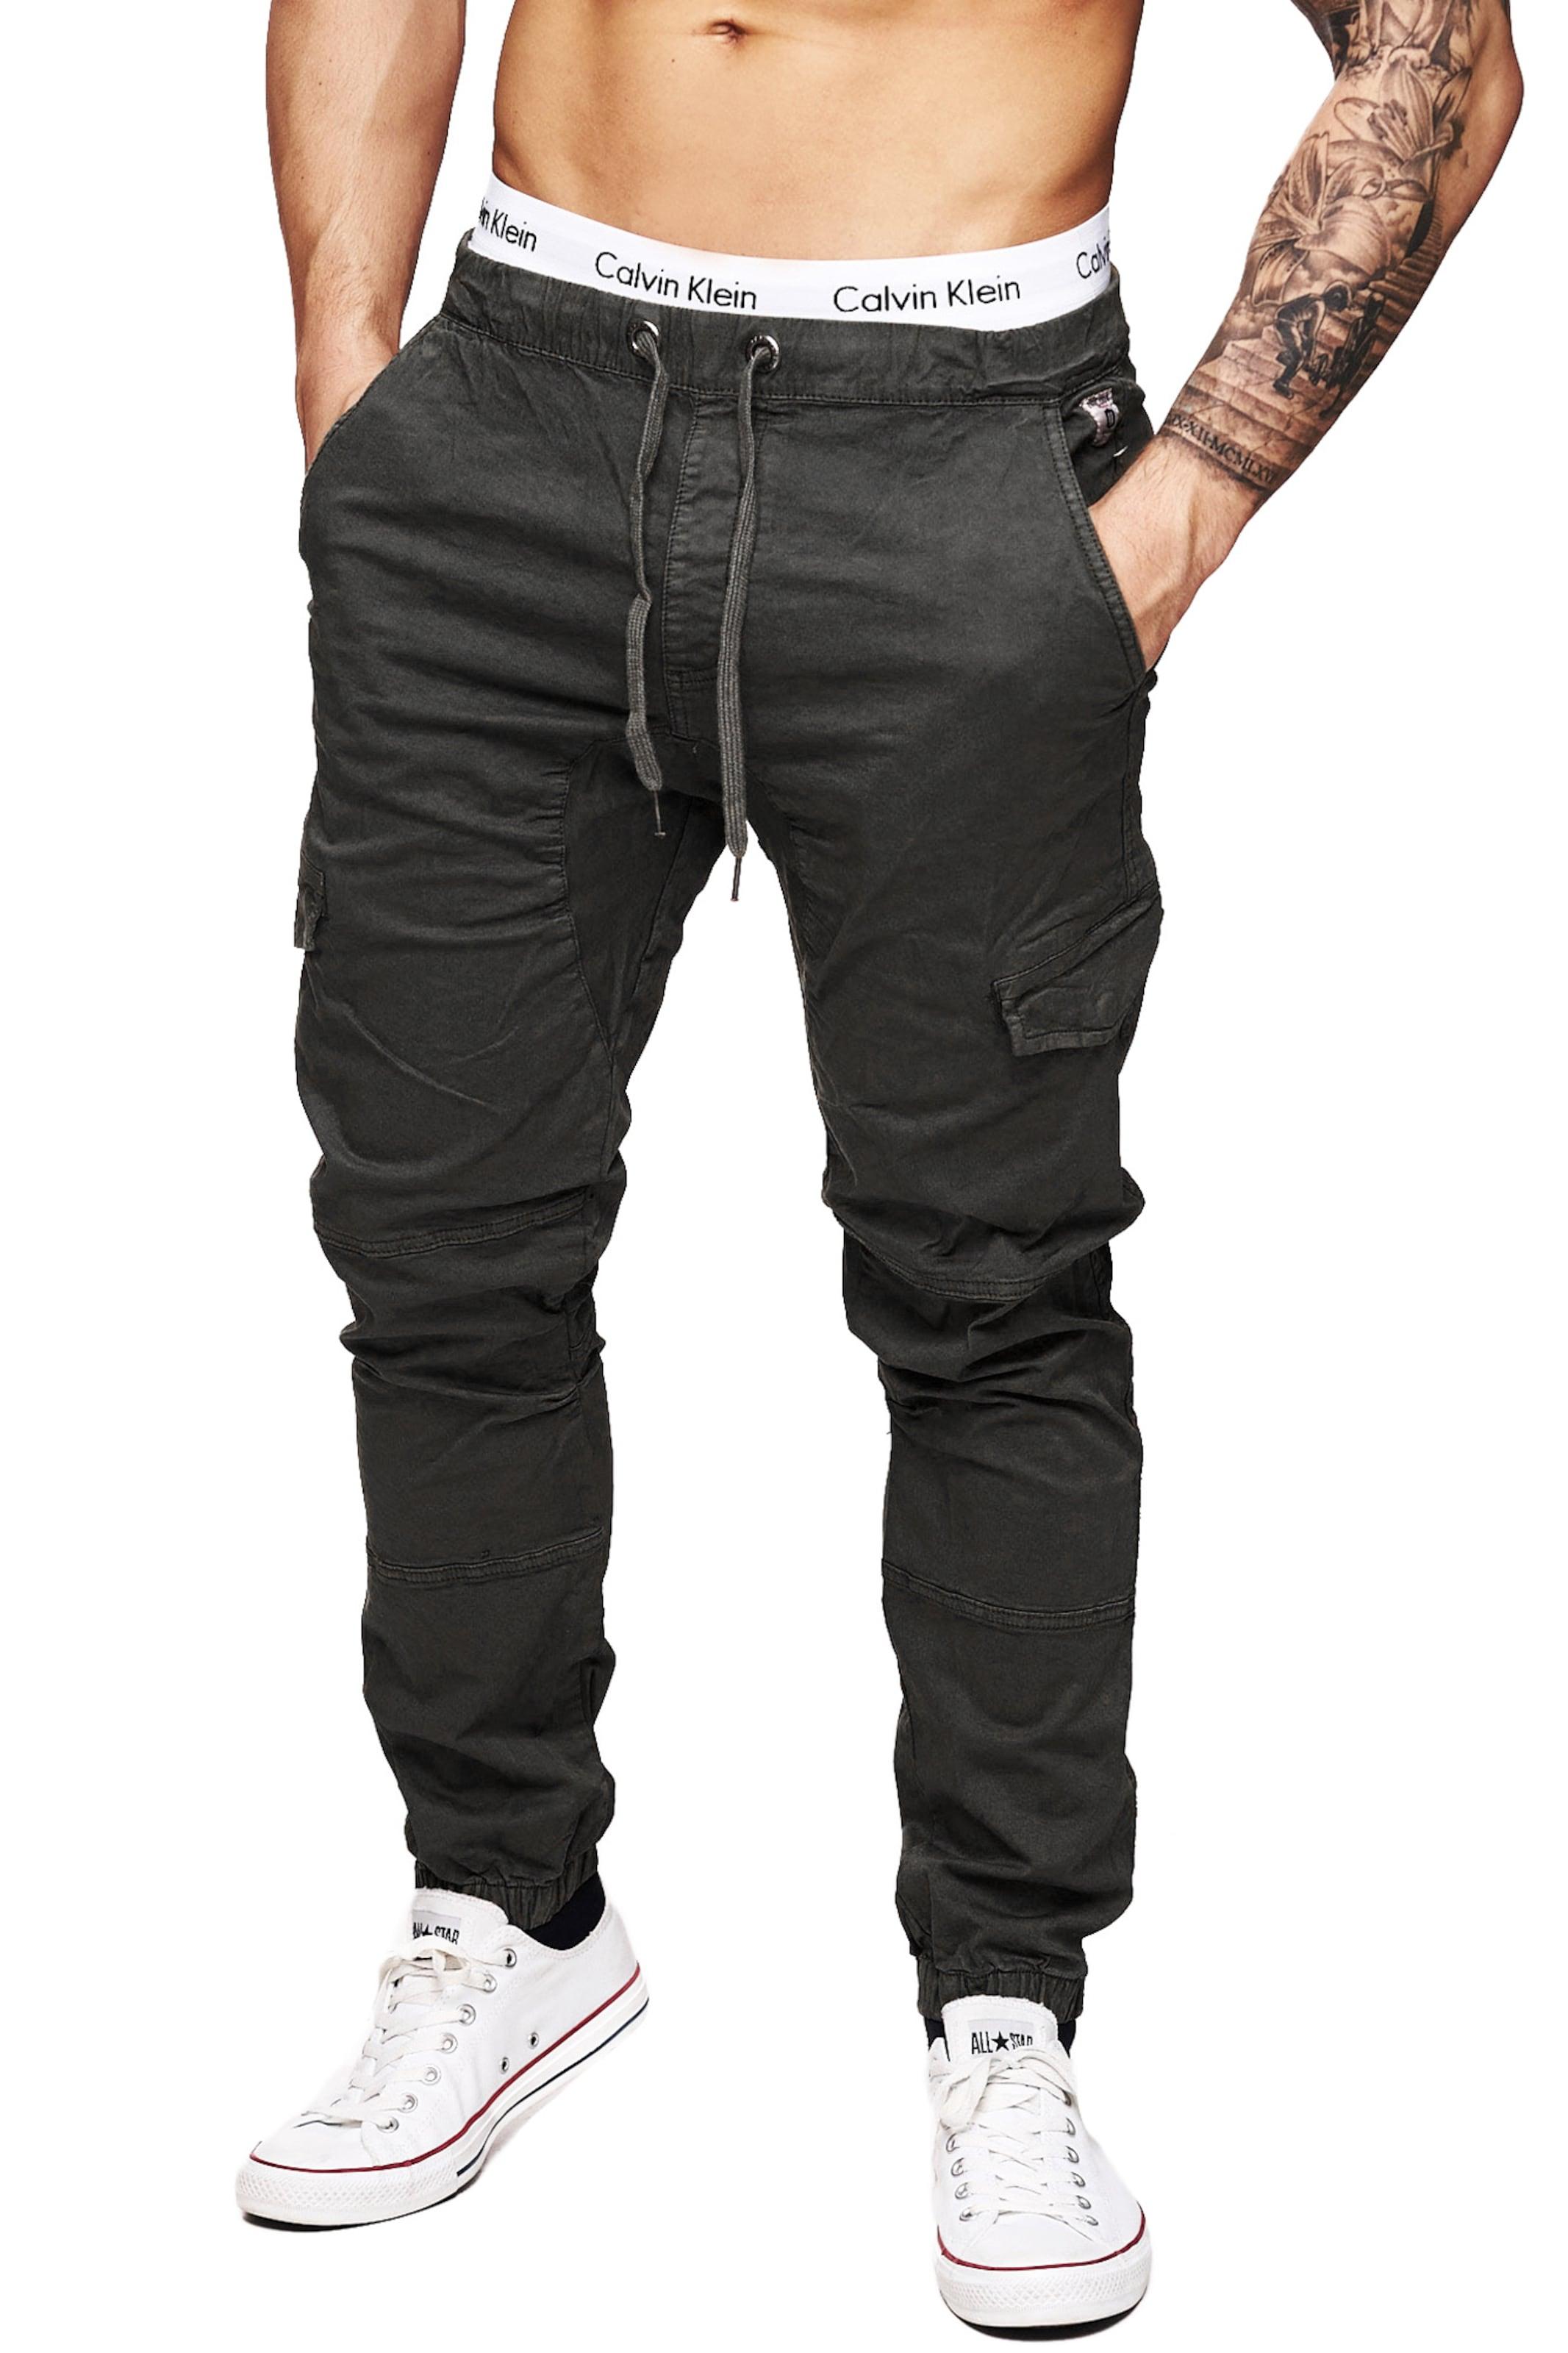 Kaki 'levi Cargo Jeans Cargo' Indicode Pantalon En 1cTlFKJ3